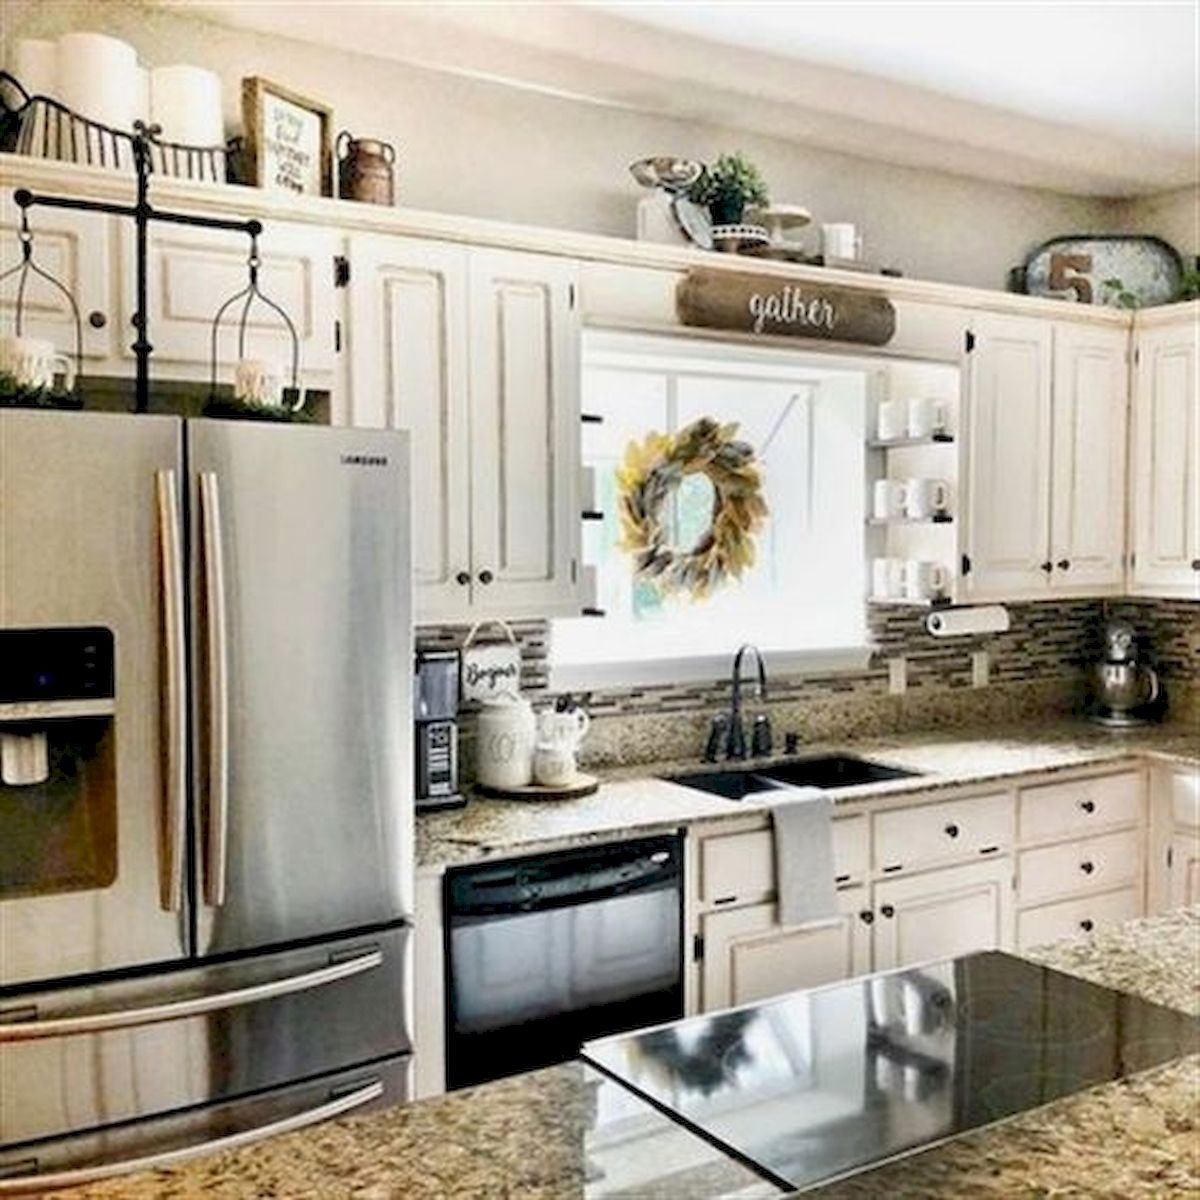 45 Easy Kitchen Decor and Design Ideas (38)